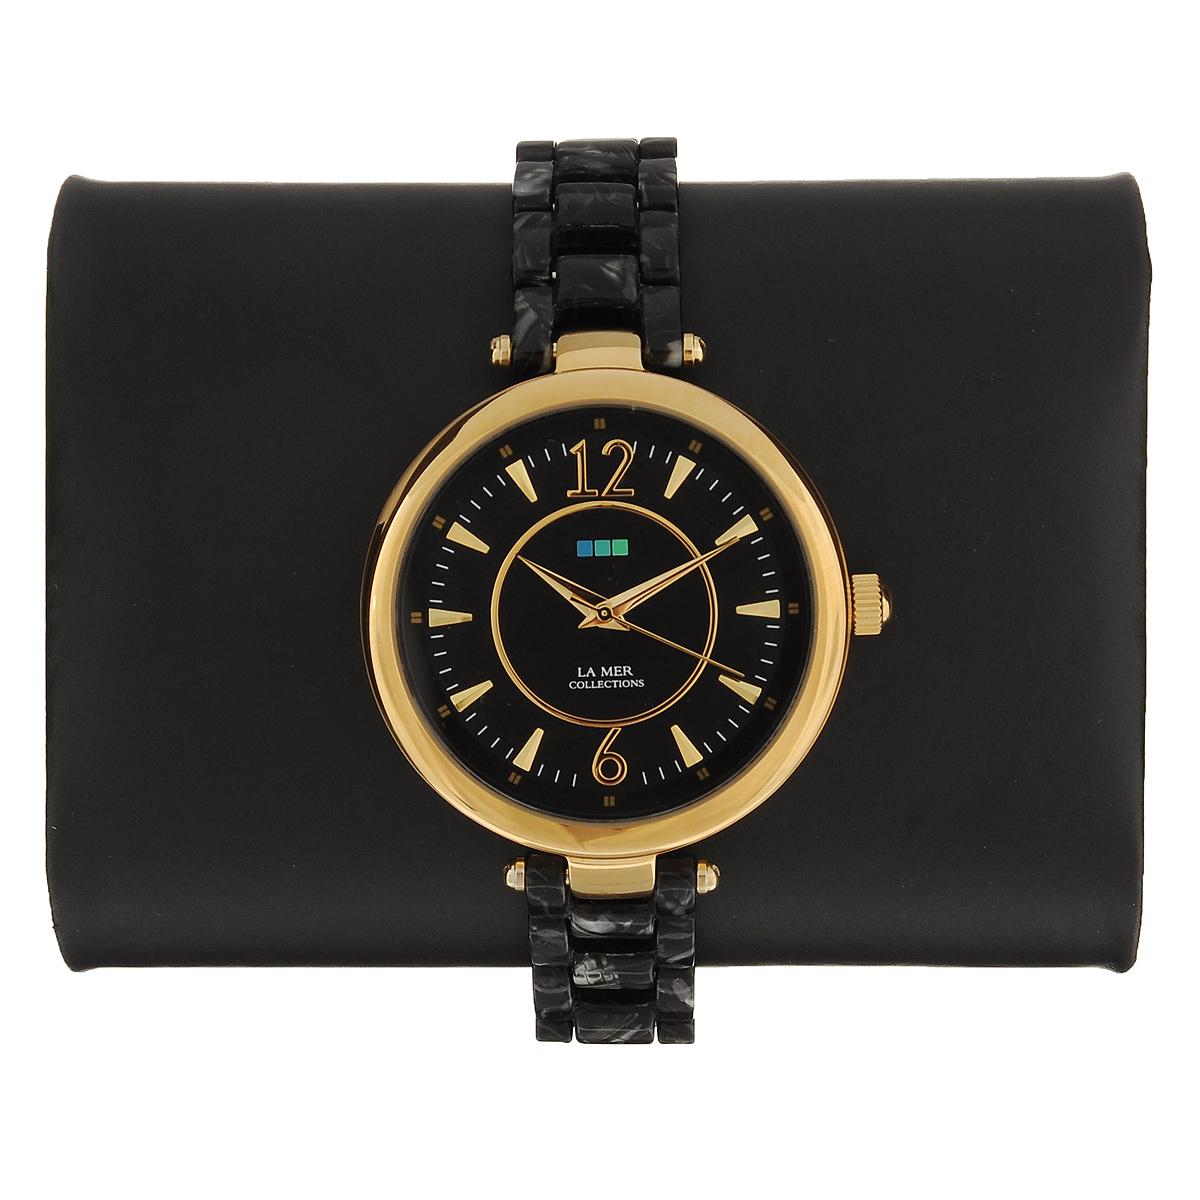 "Часы наручные женские La Mer Collections ""Gold Black/Silver Black Dial"". LMSICILY005 ( LMSICILY005 )"